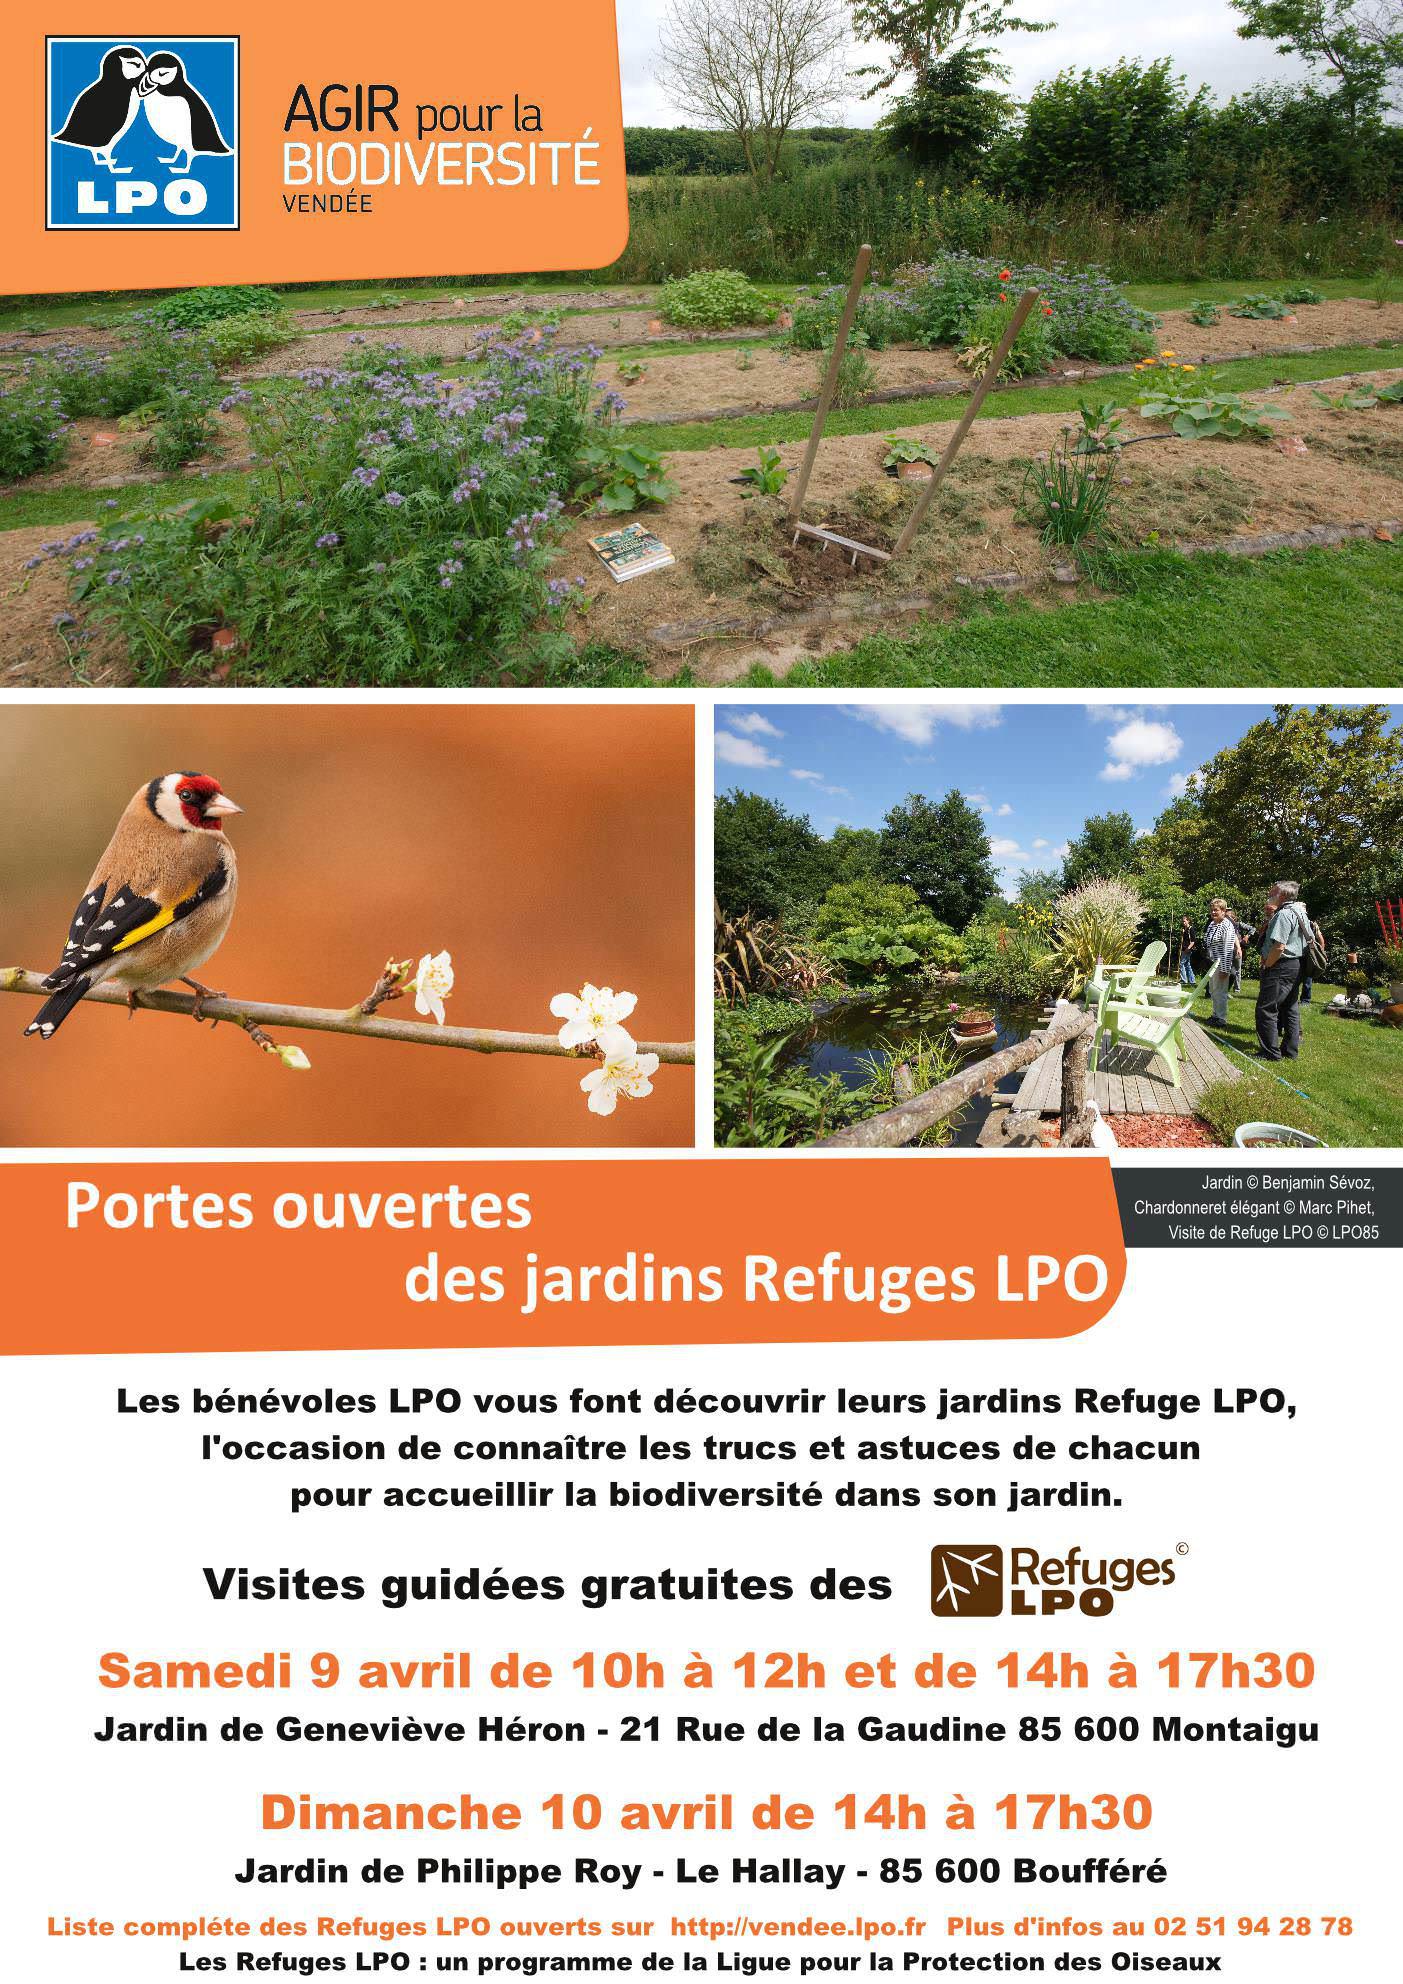 Portes ouvertes du jardin Refuge LPO de Geneviève